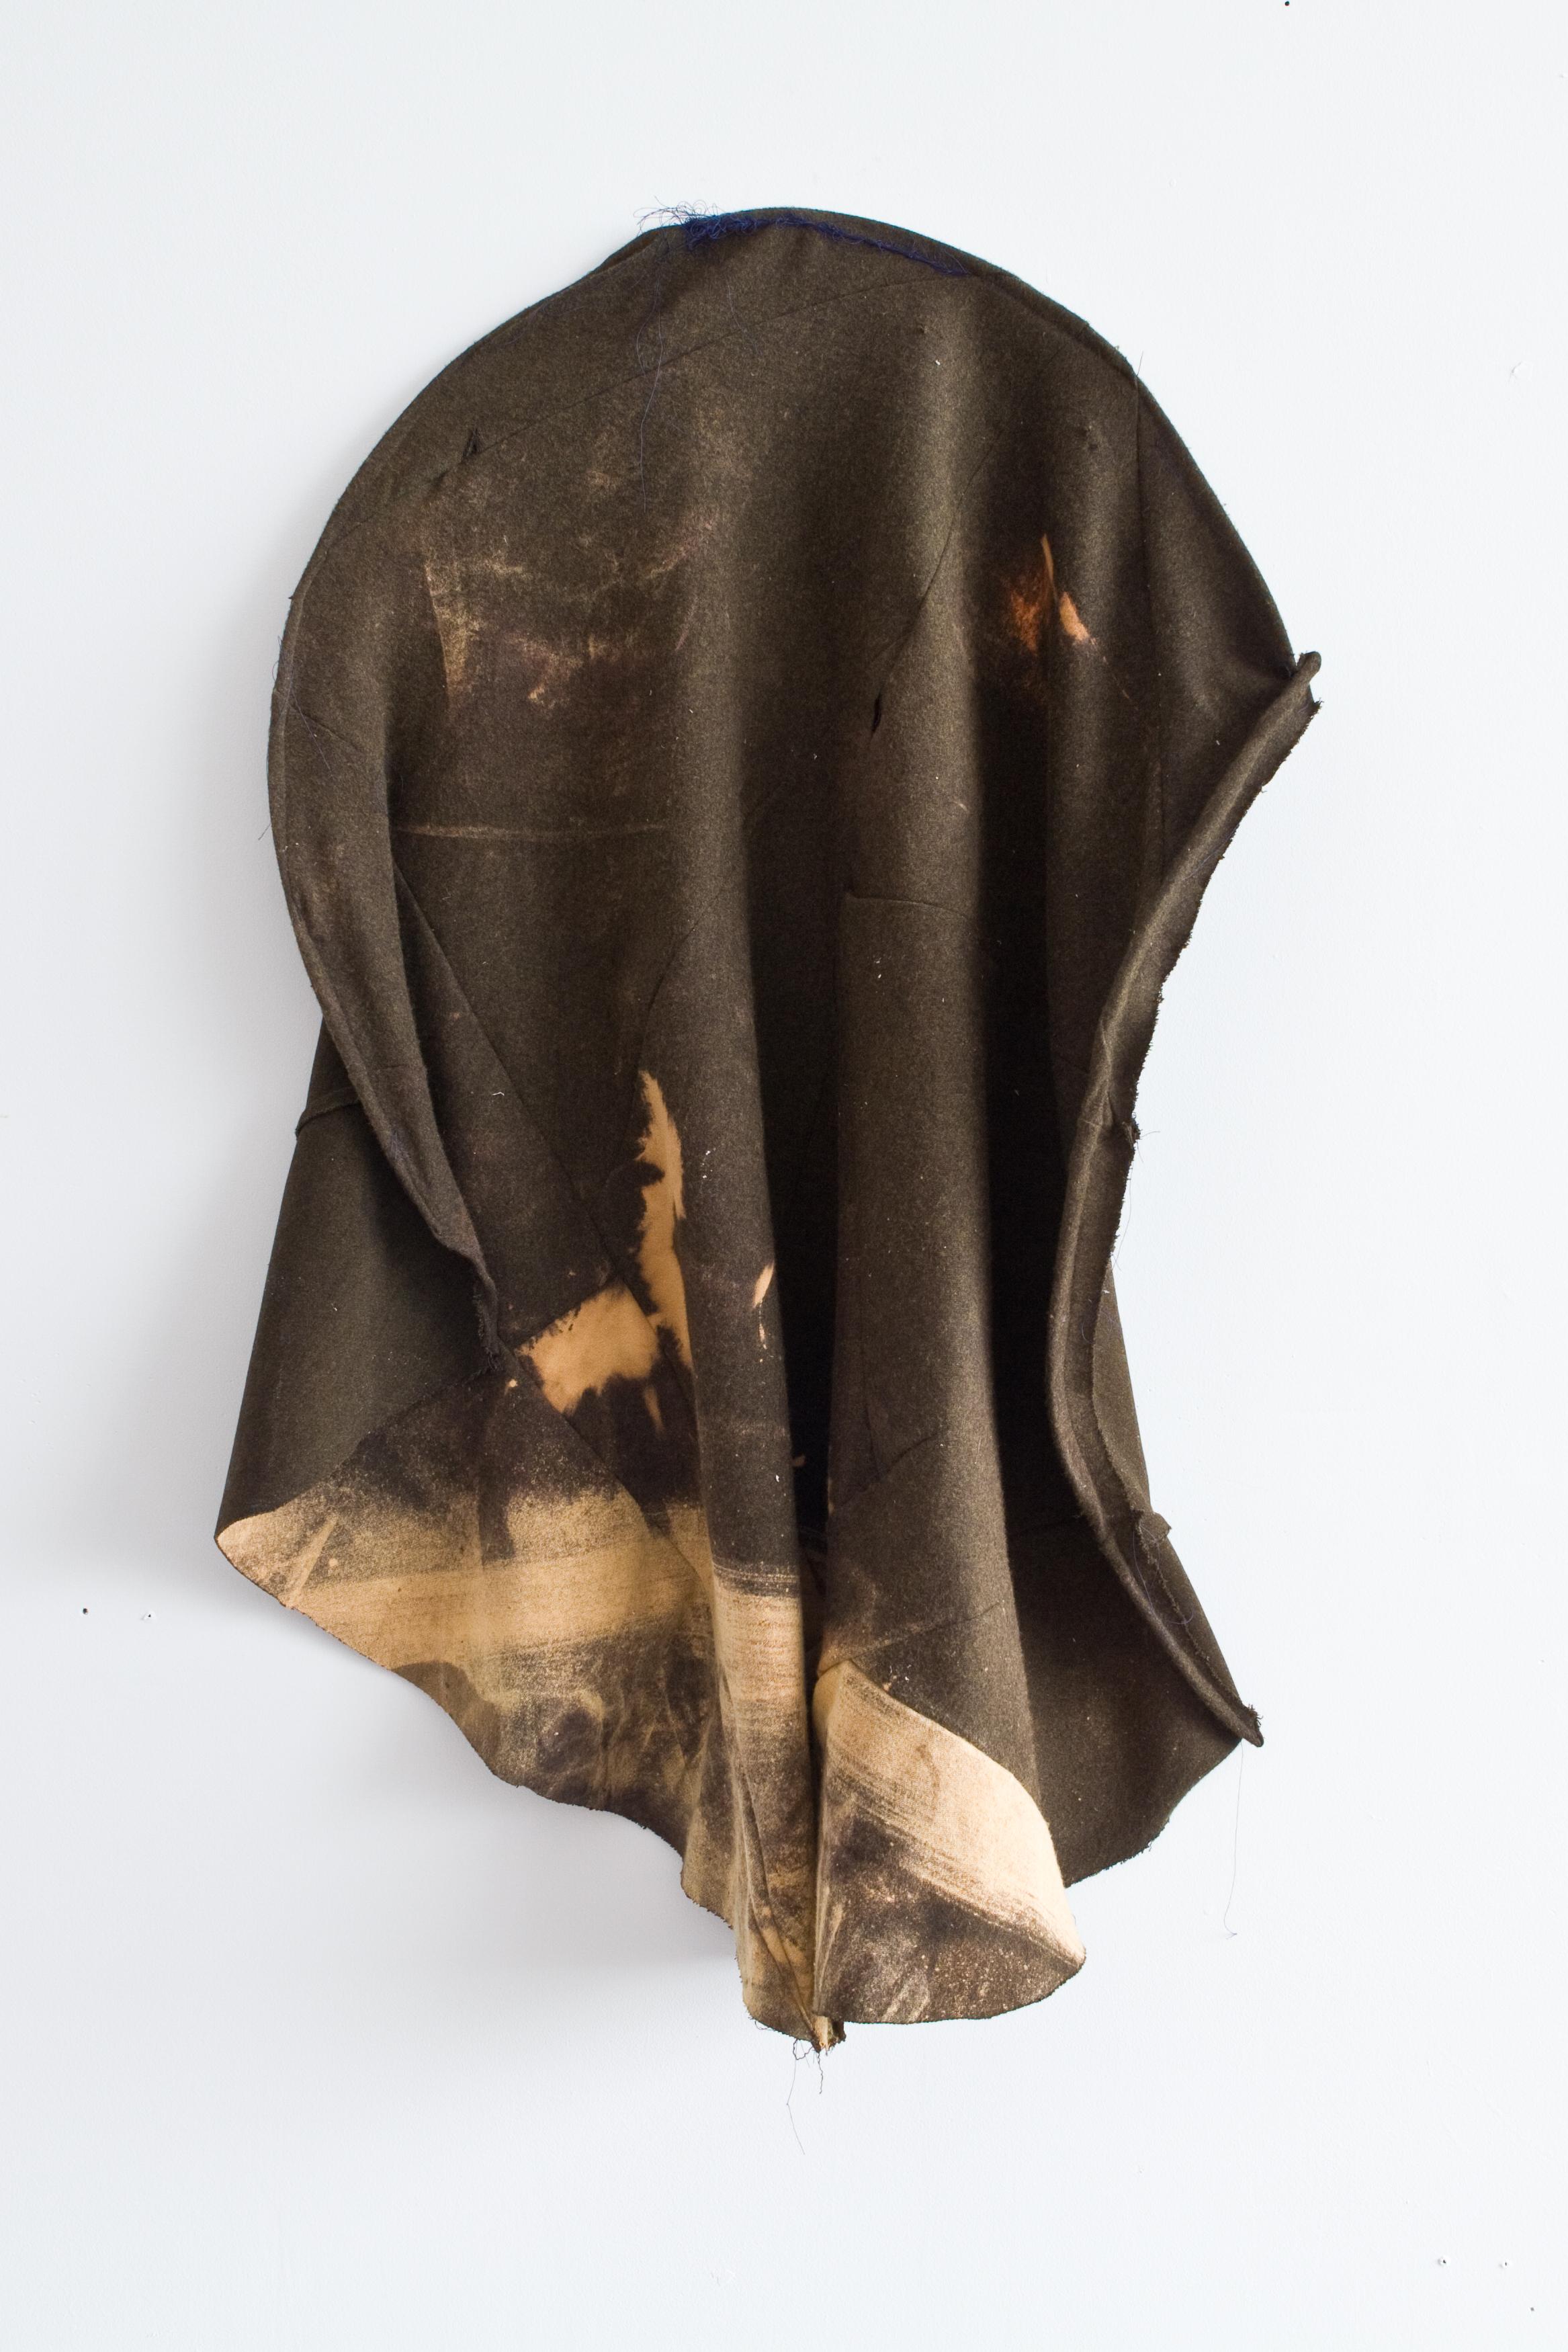 R.F.S. | Sewn fabric, steel wire, bleach, 2017